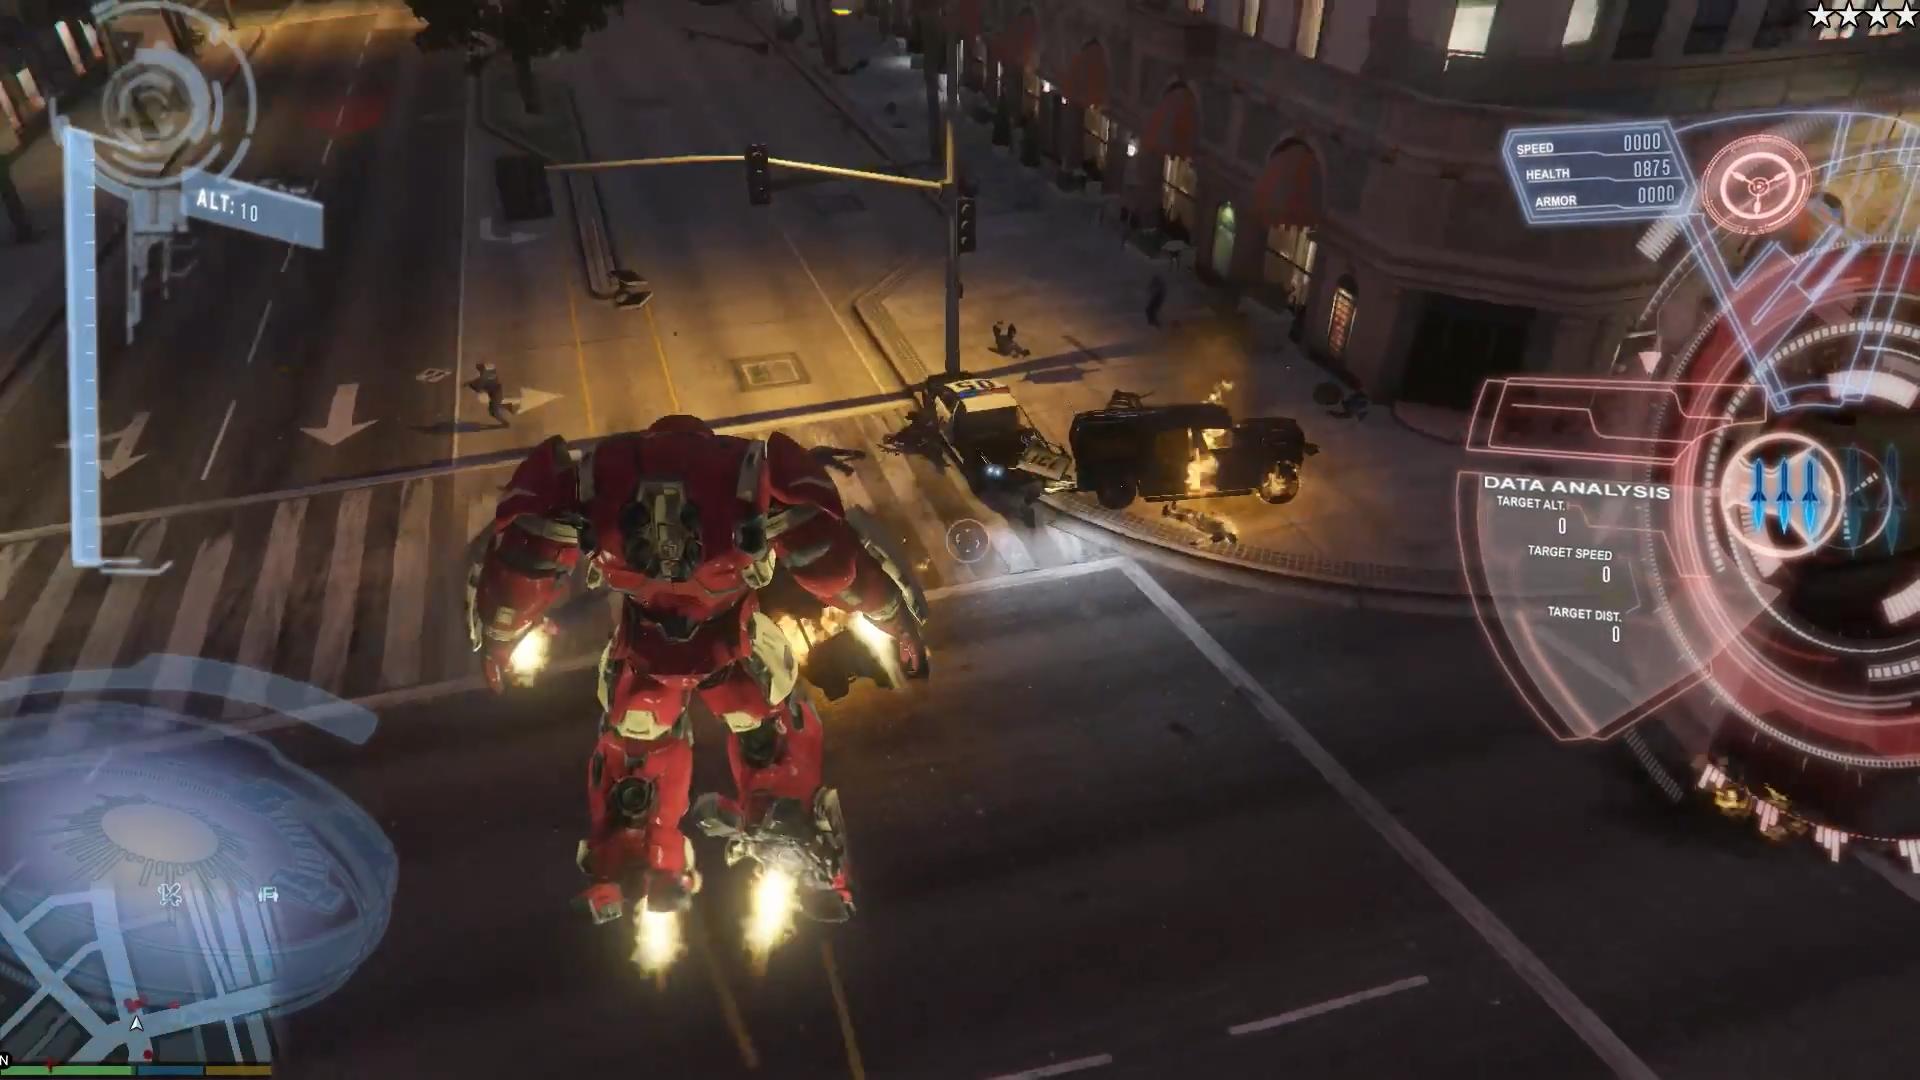 Gta 5 Iron Man Mod Free